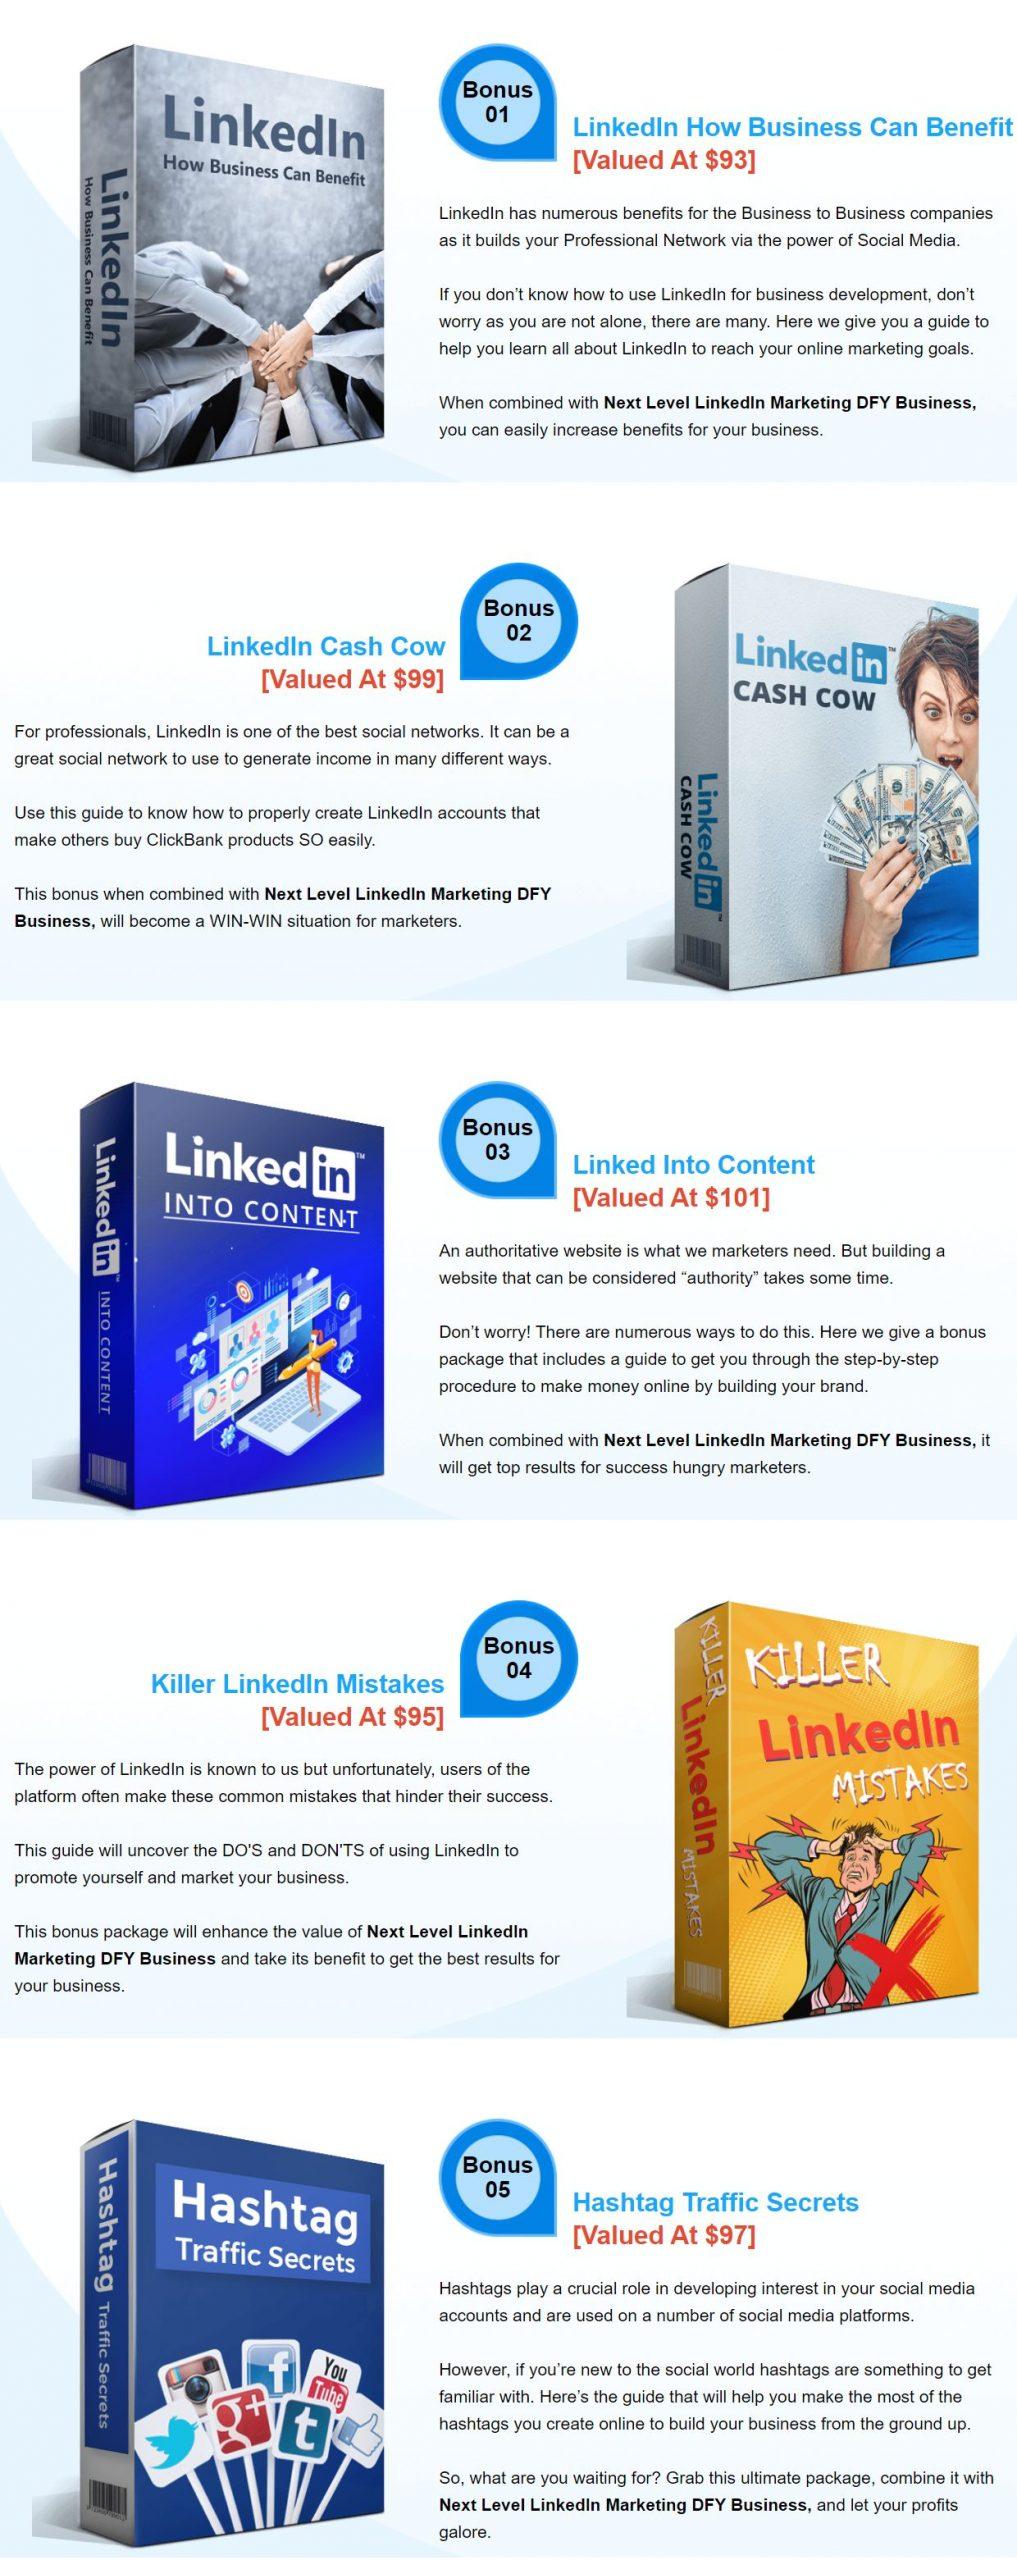 Next-Level-LinkedIn-Marketing-DFY-Business-PLR-Bonus-1